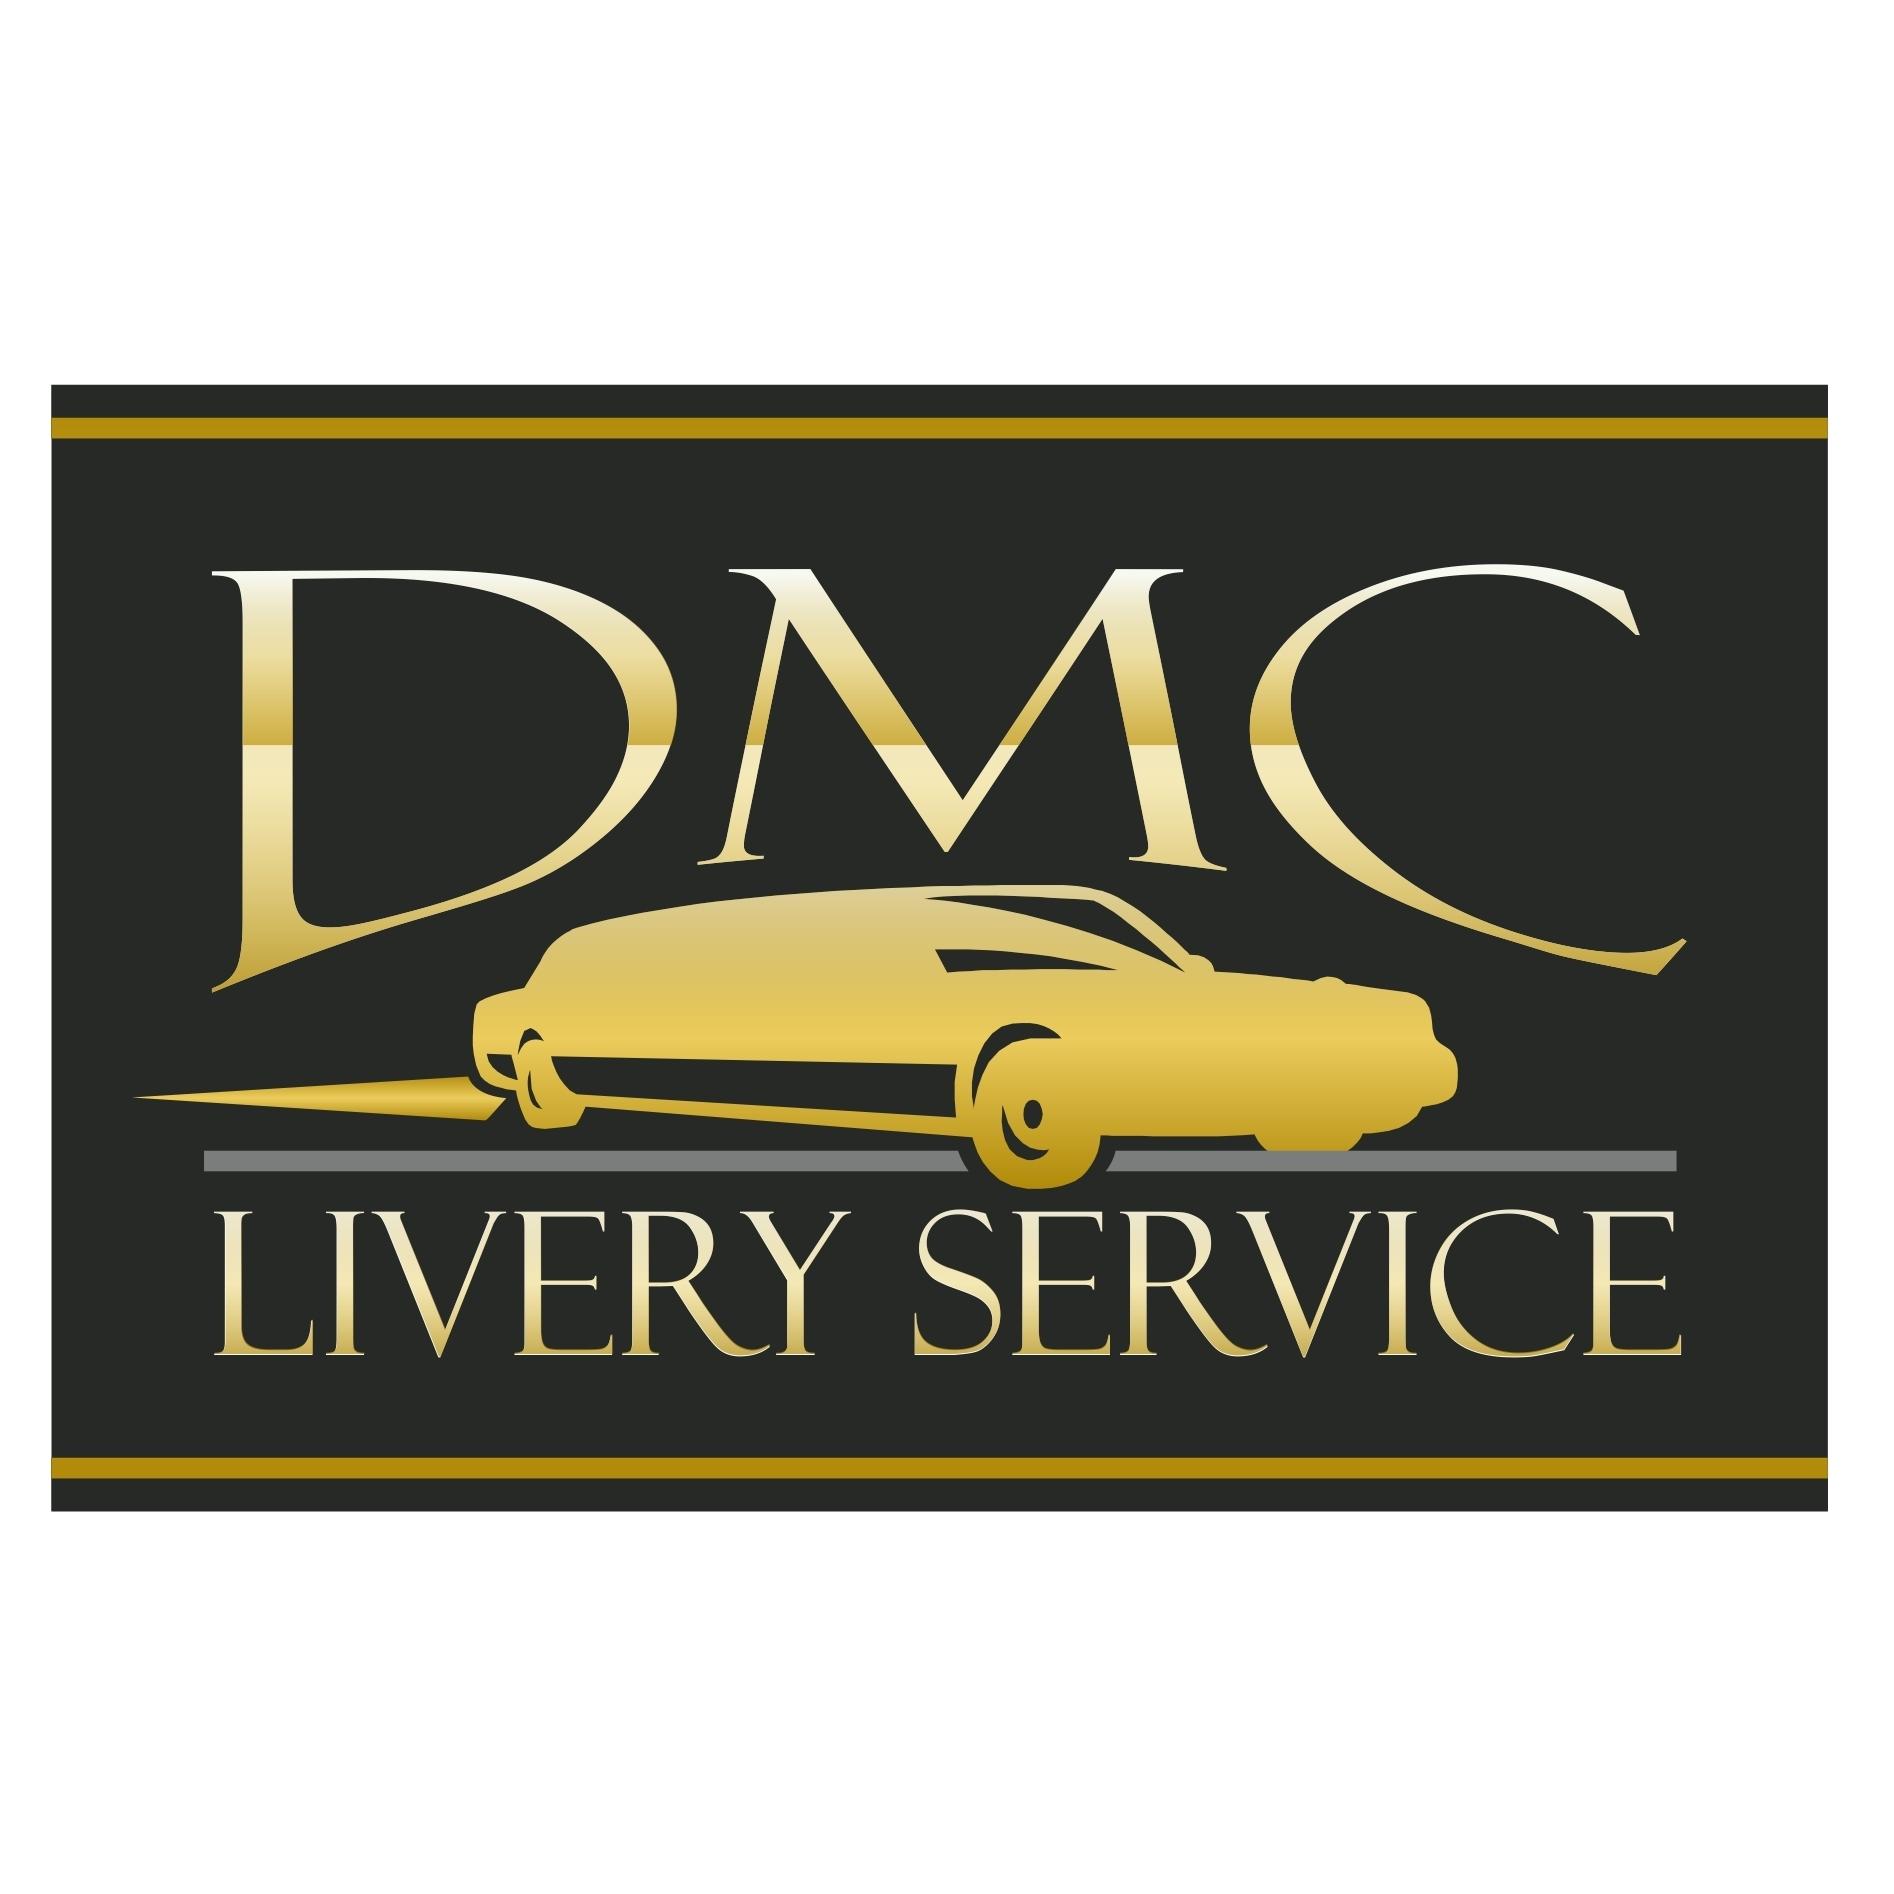 DMC Livery Service Logo